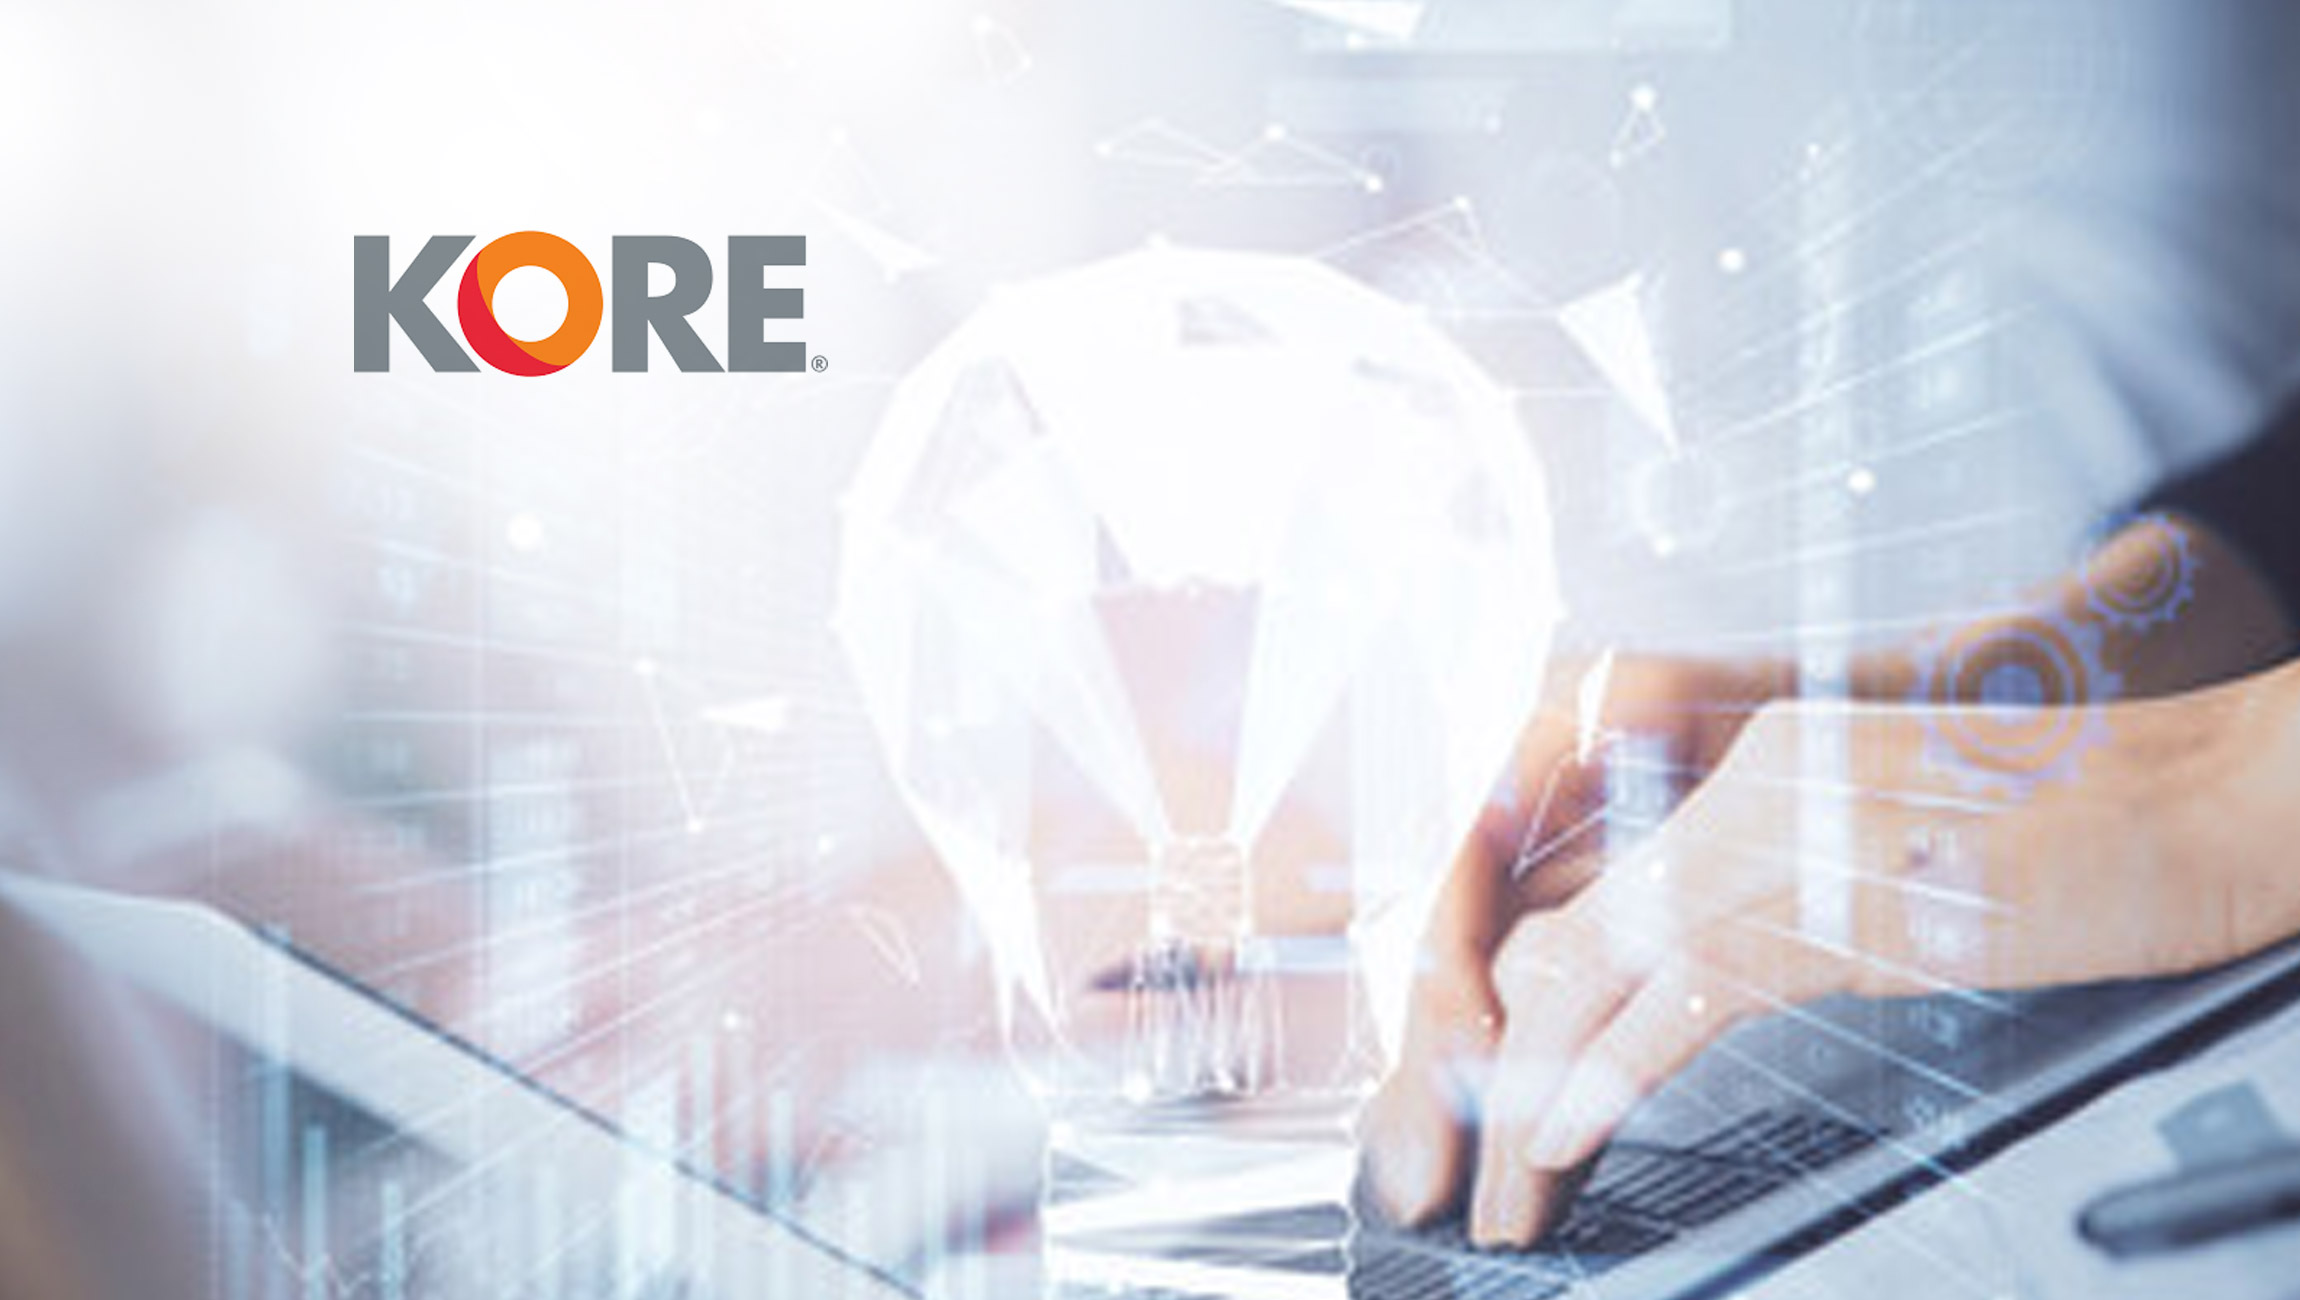 KORE-and-Koch-Strategic-Platforms-to-Explore-New-IoT-Innovations